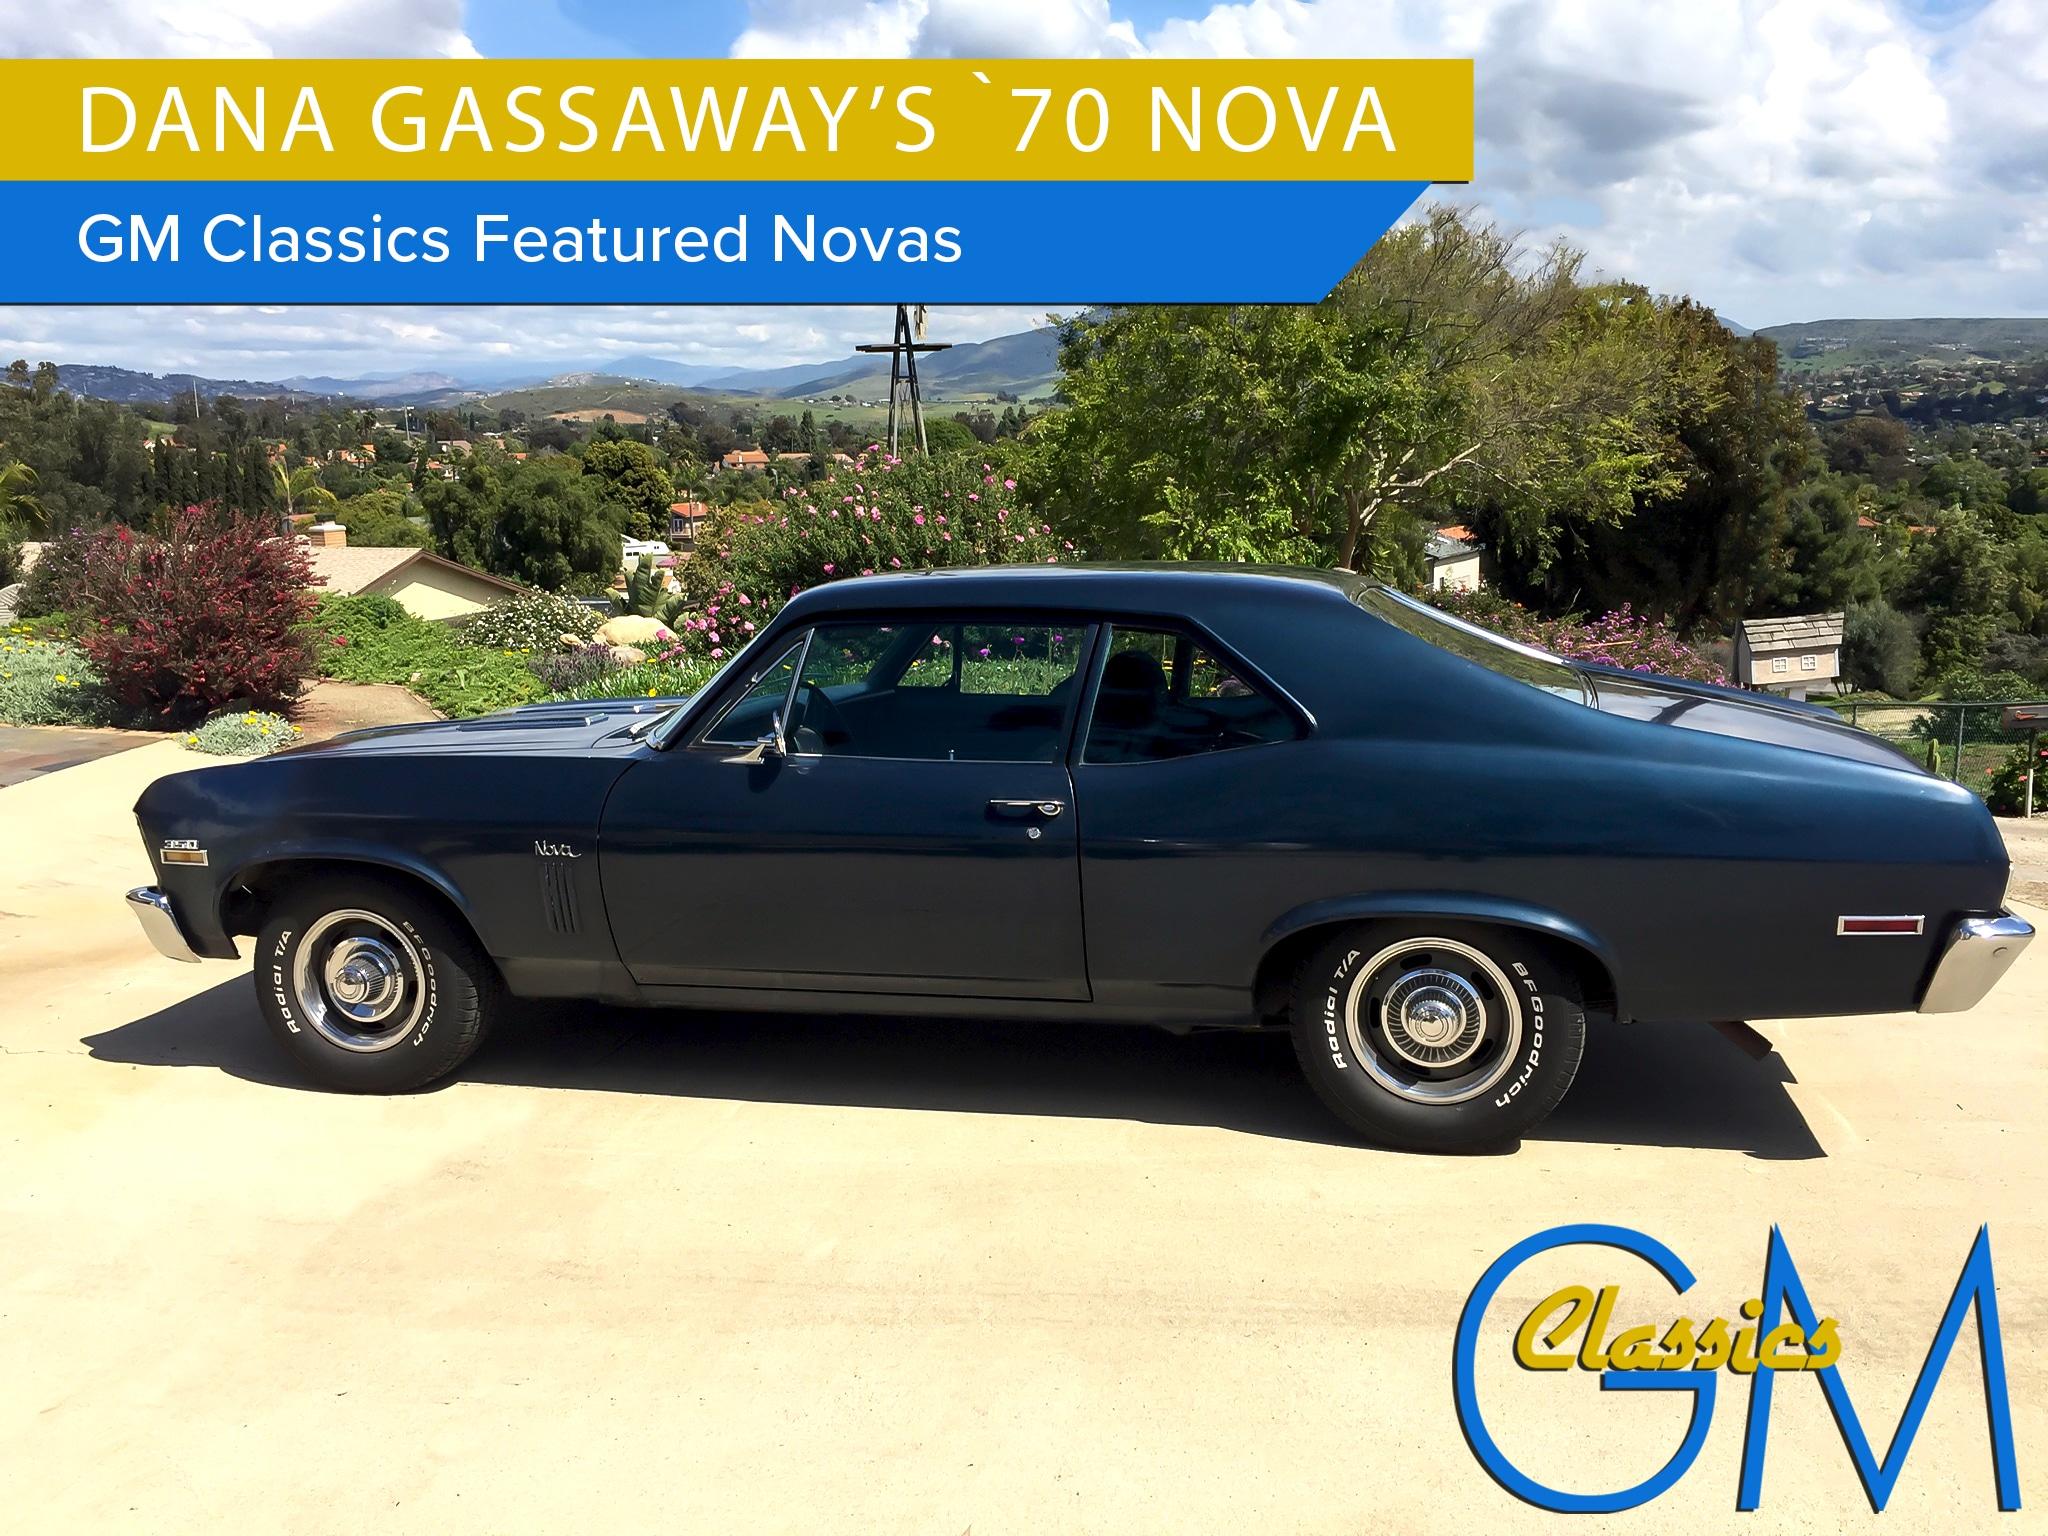 Dana Gassaway's 1970 Nova